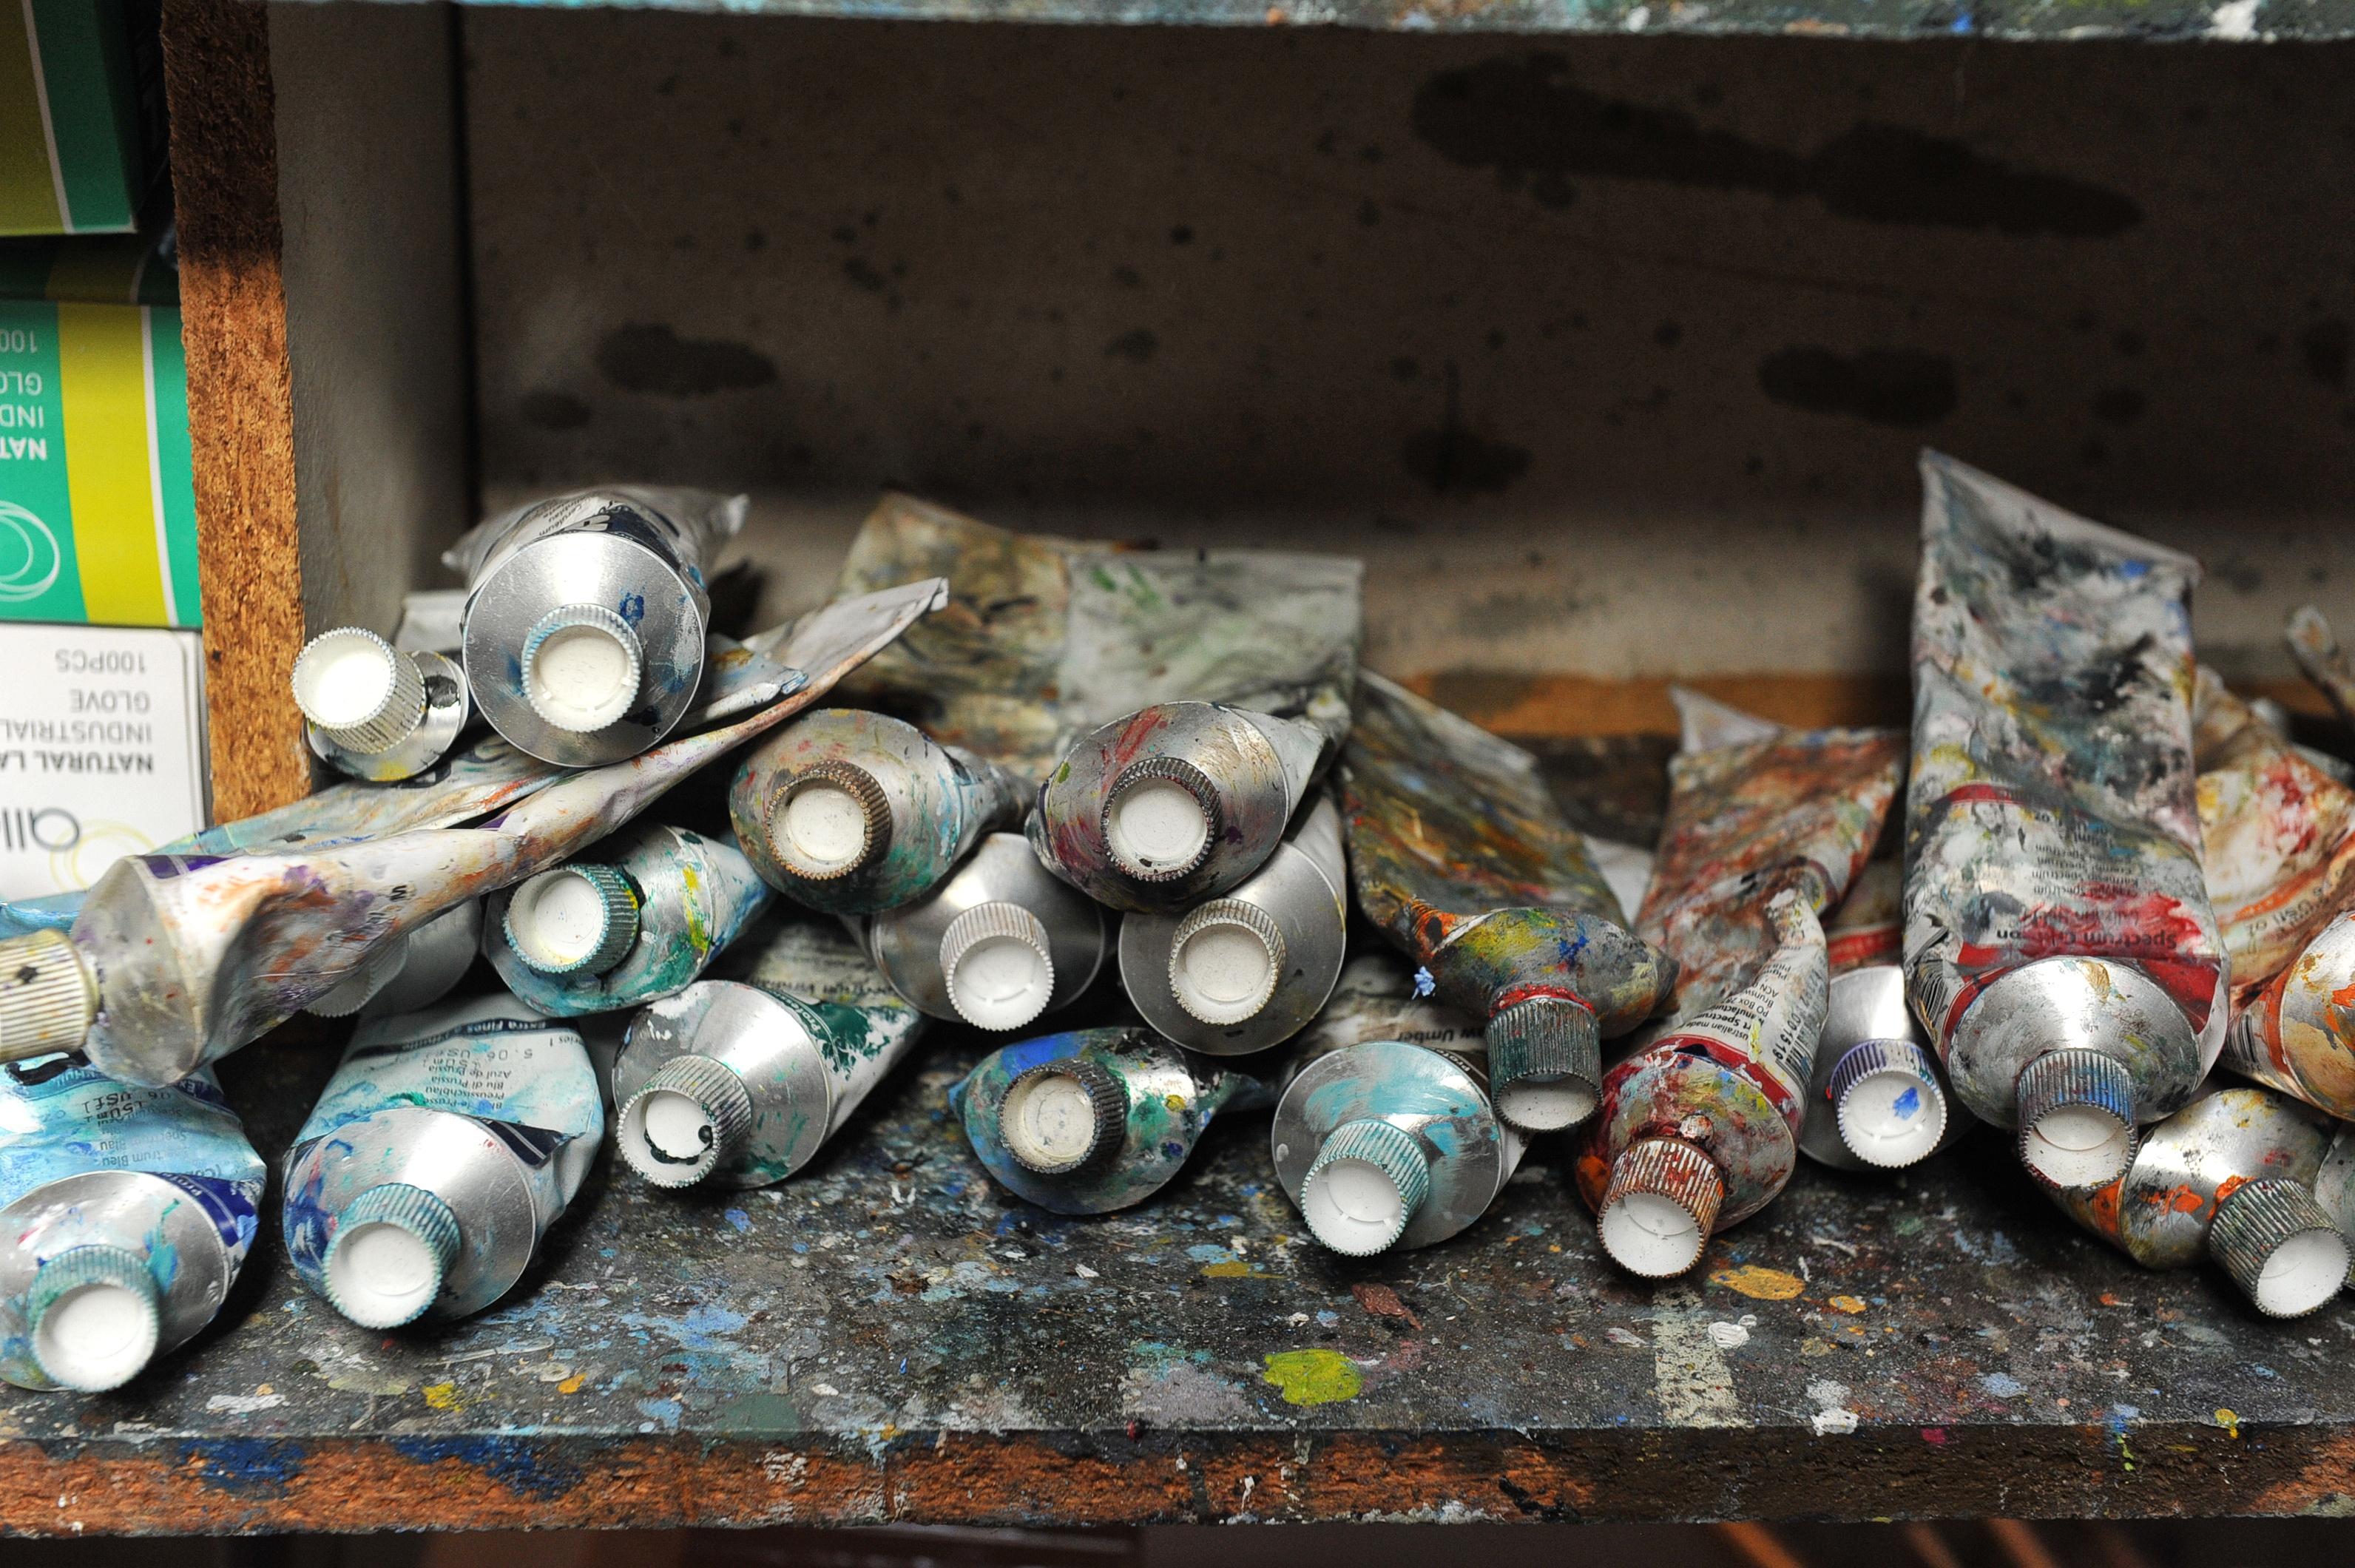 Phil Henshall Artist's Studio